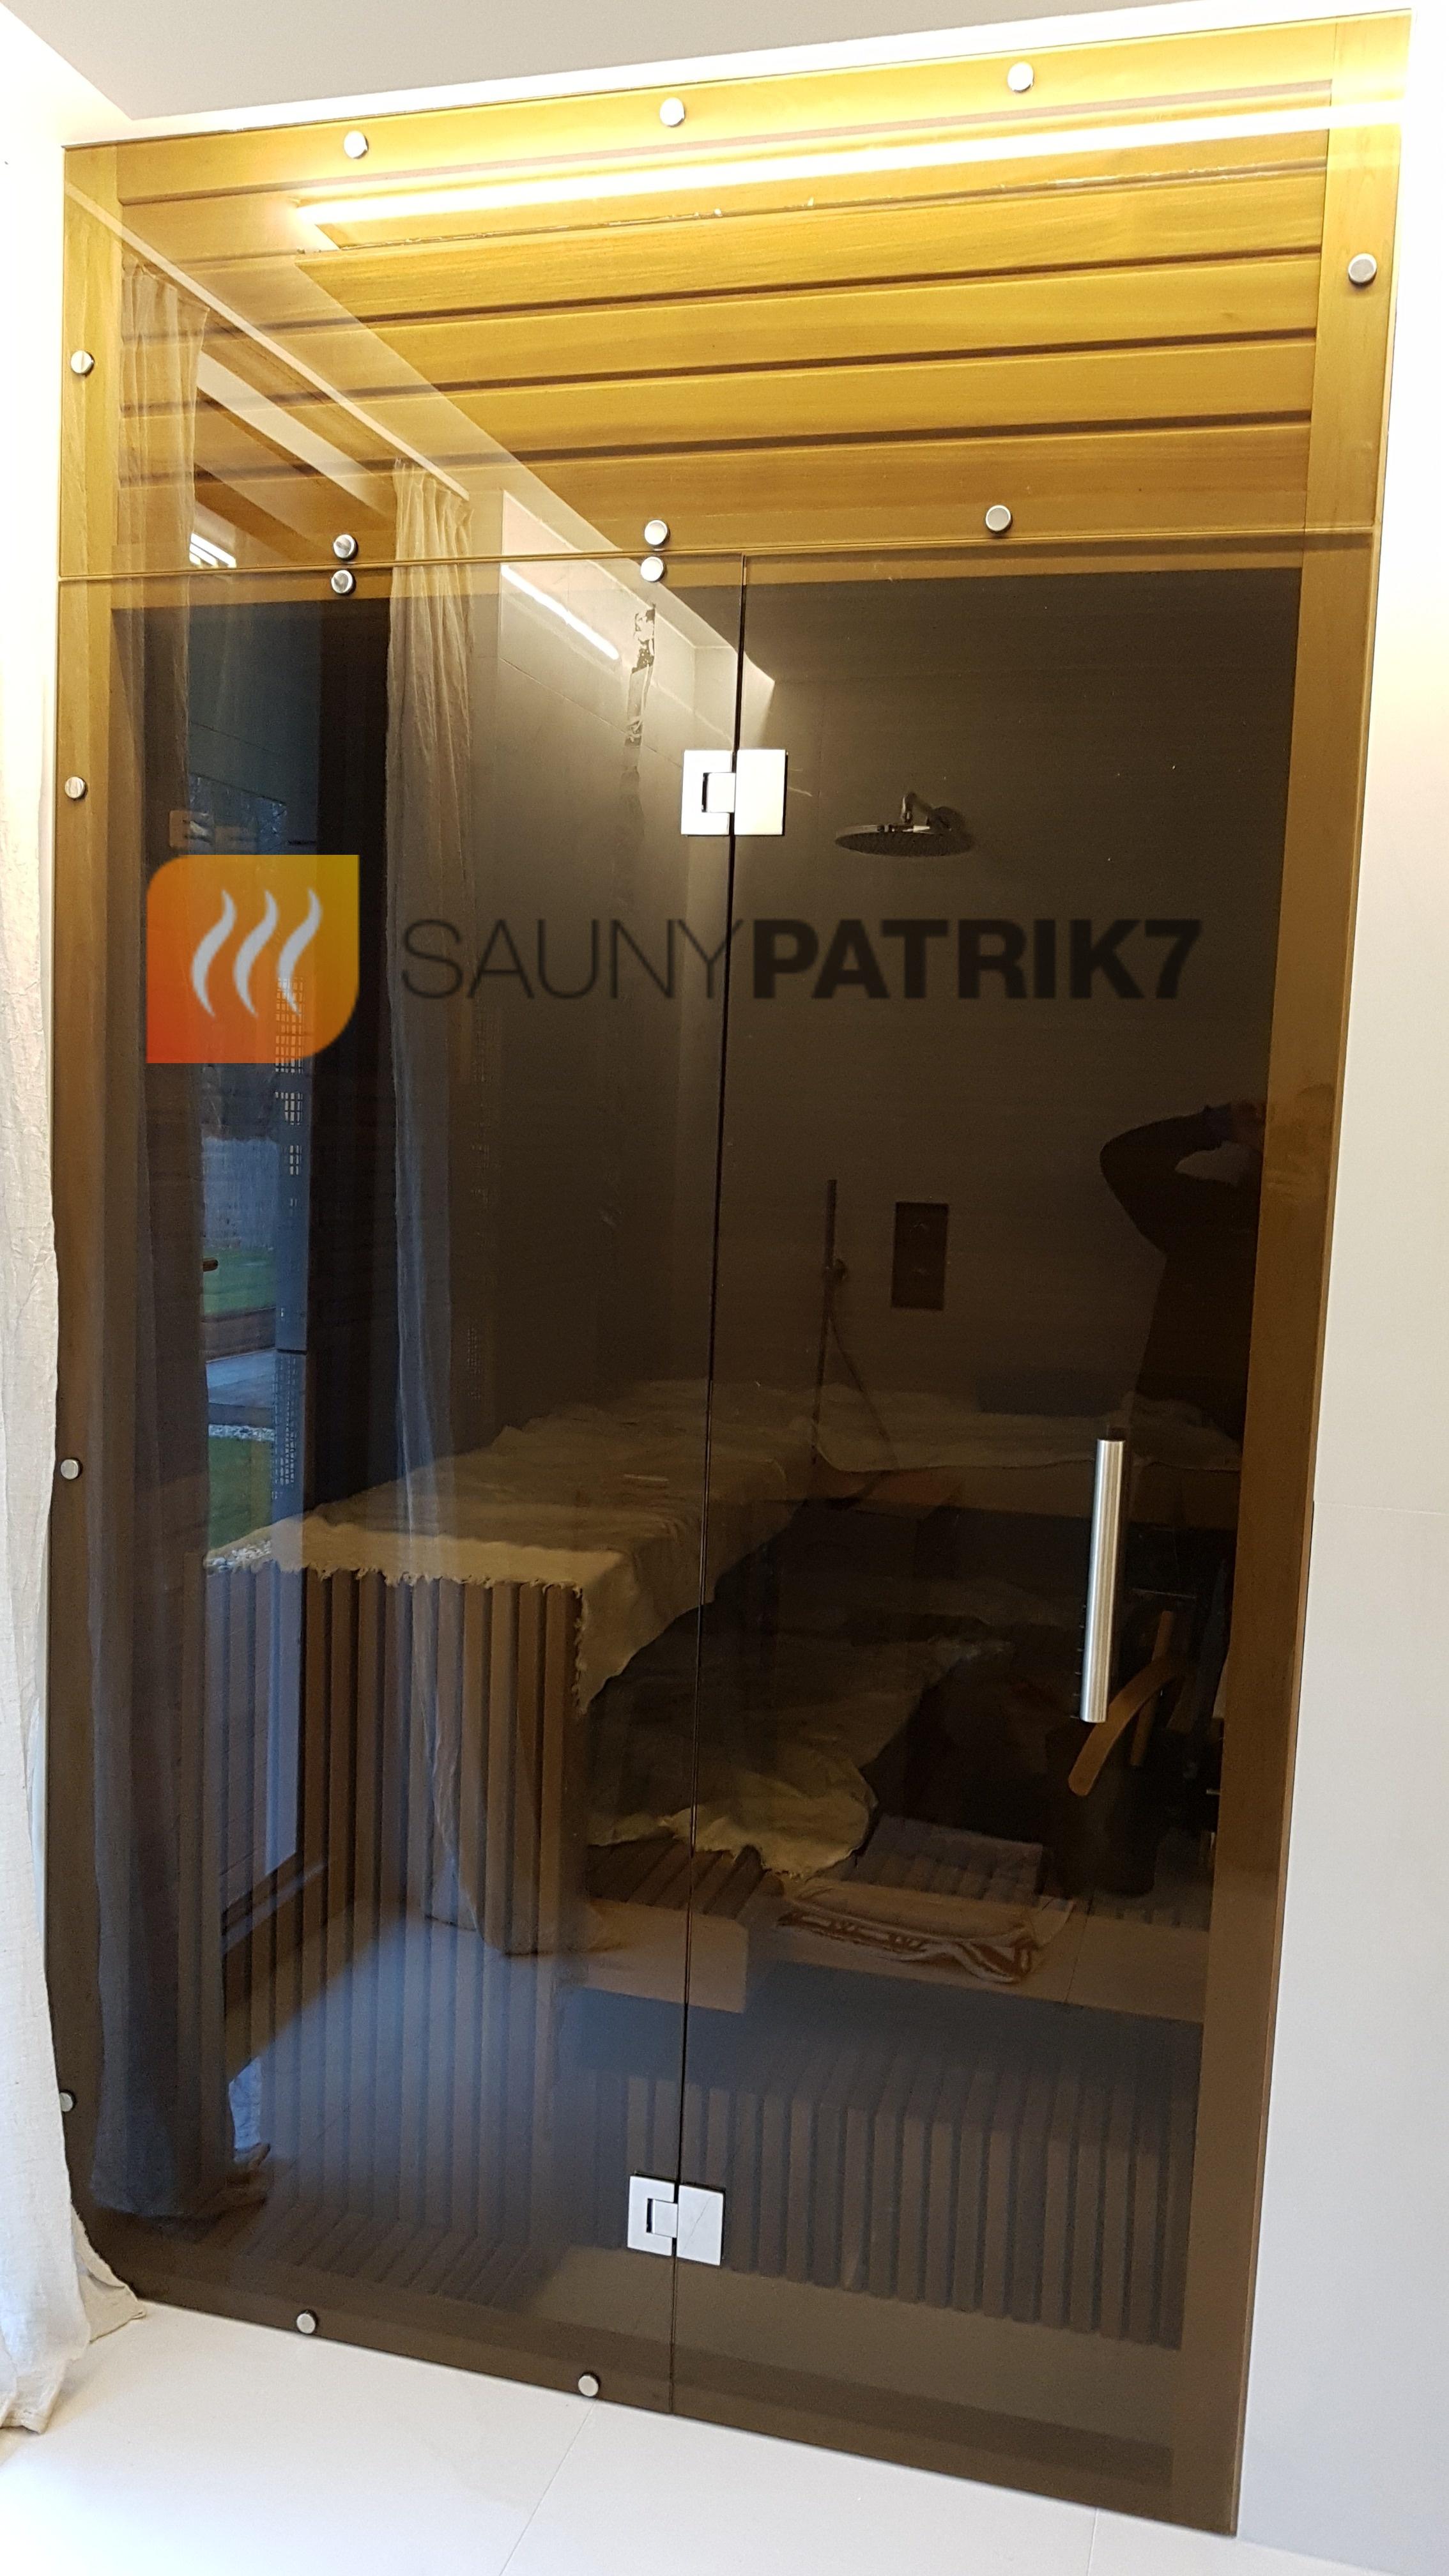 A-typ presklenie exklusive - sauny patrik 7